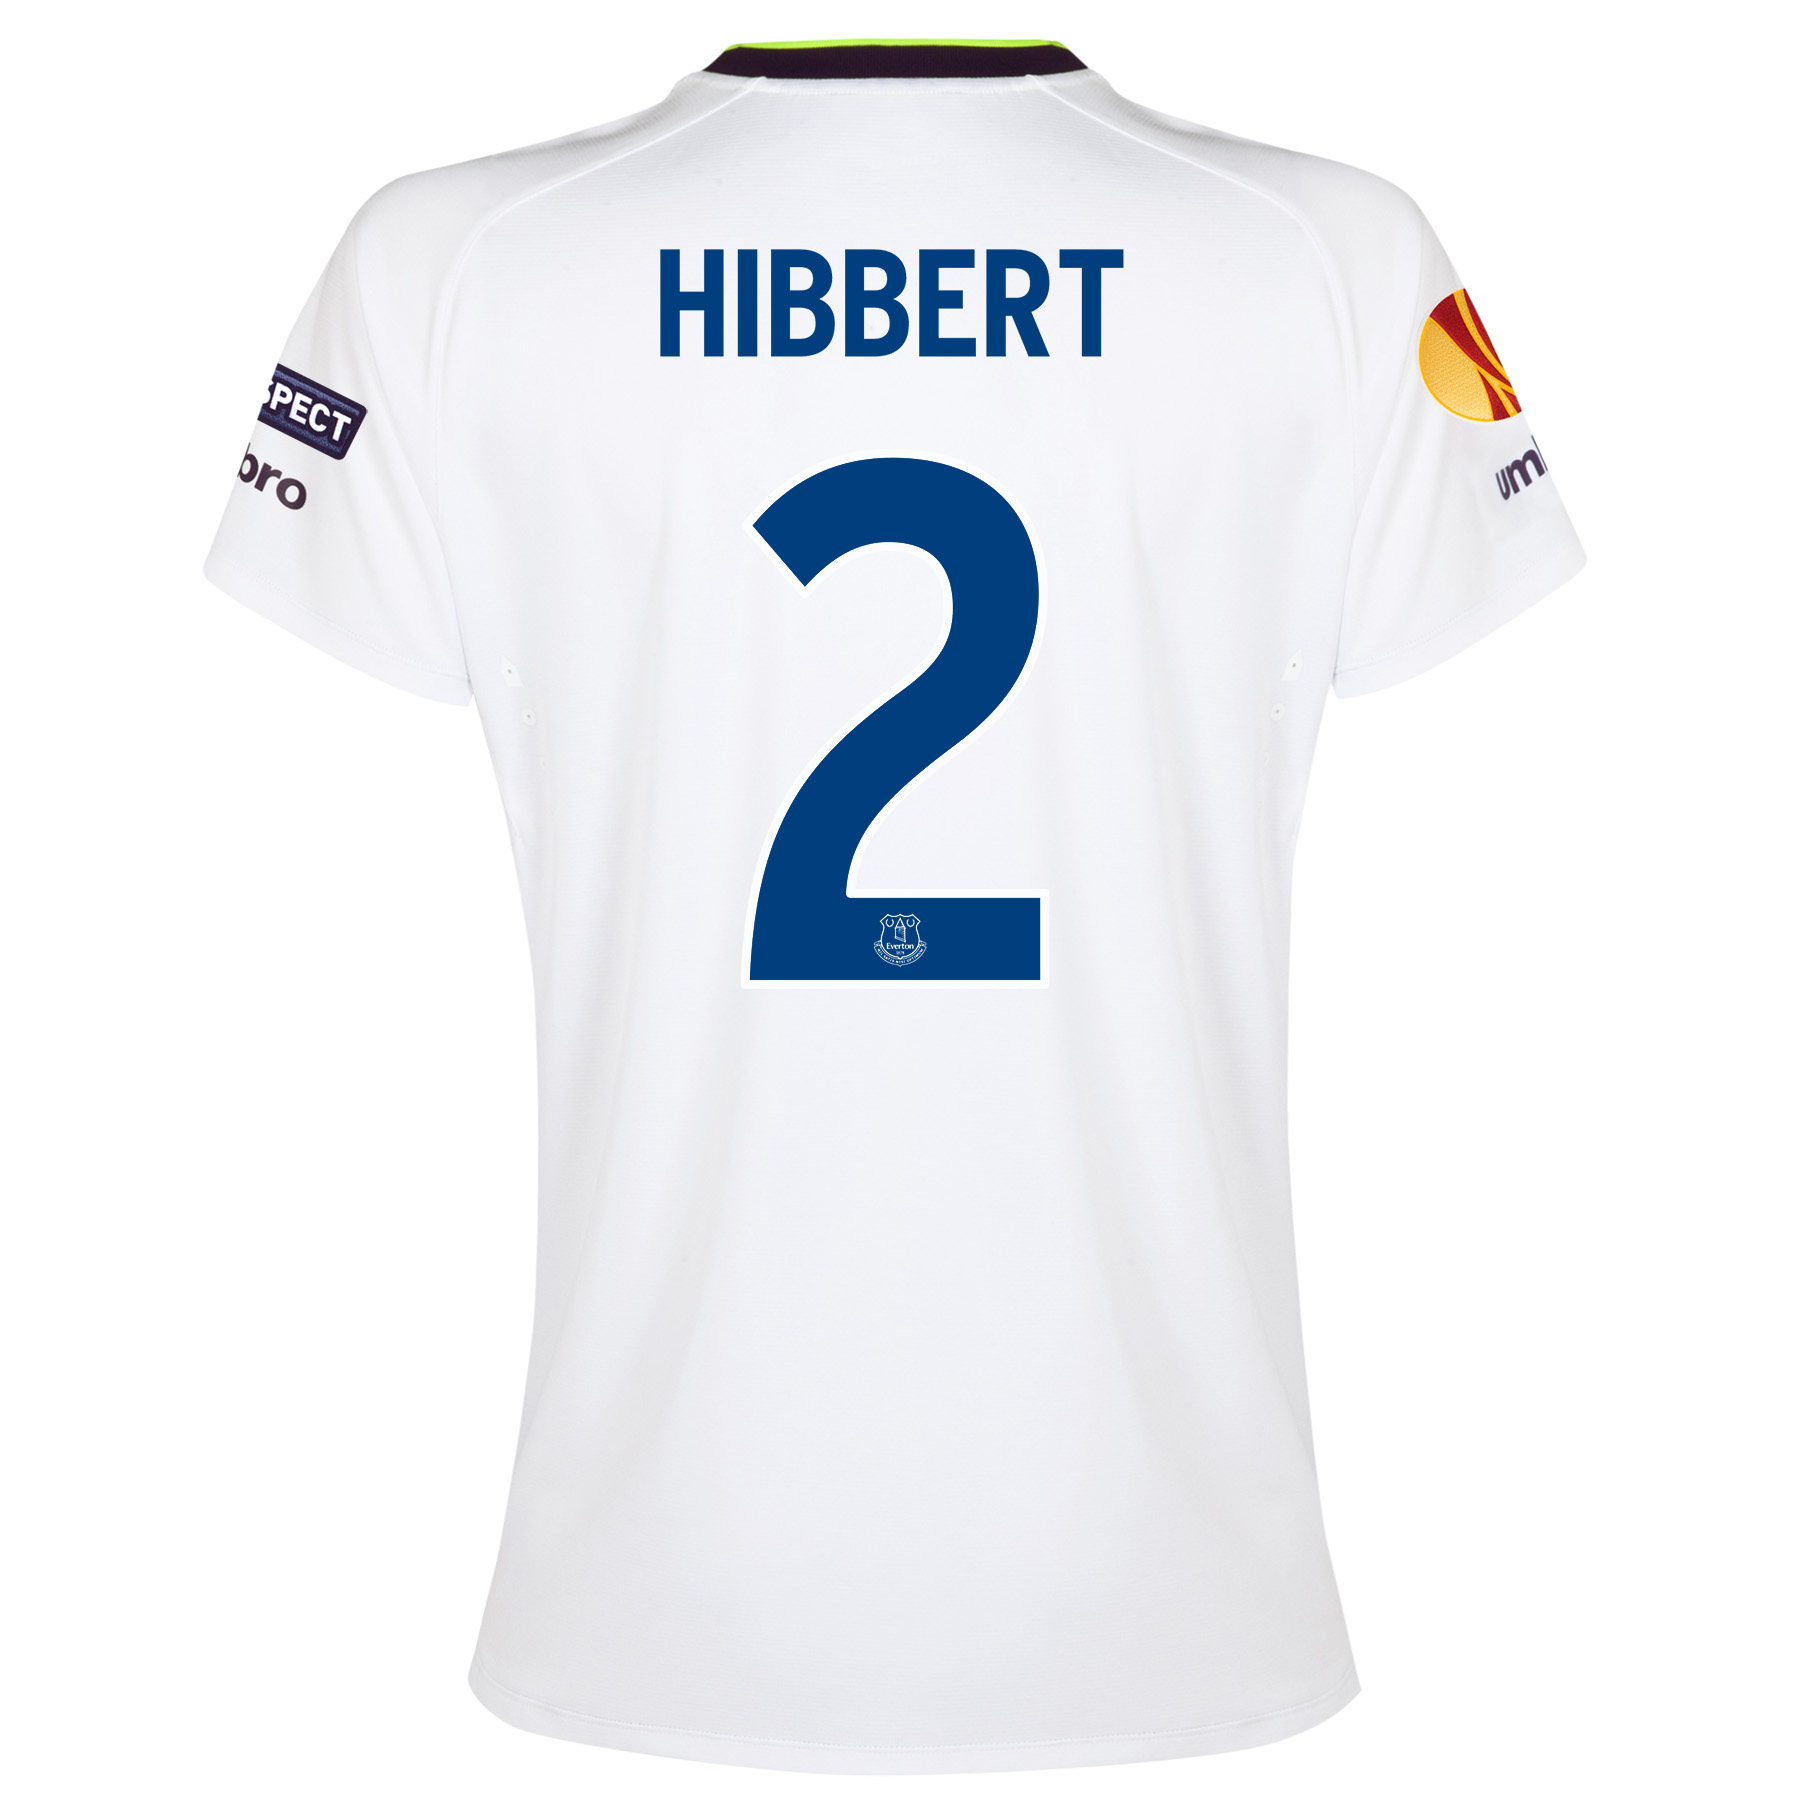 Everton UEFA Europa League 3rd Shirt 2014/15 - Womens with Hibbert 2 p